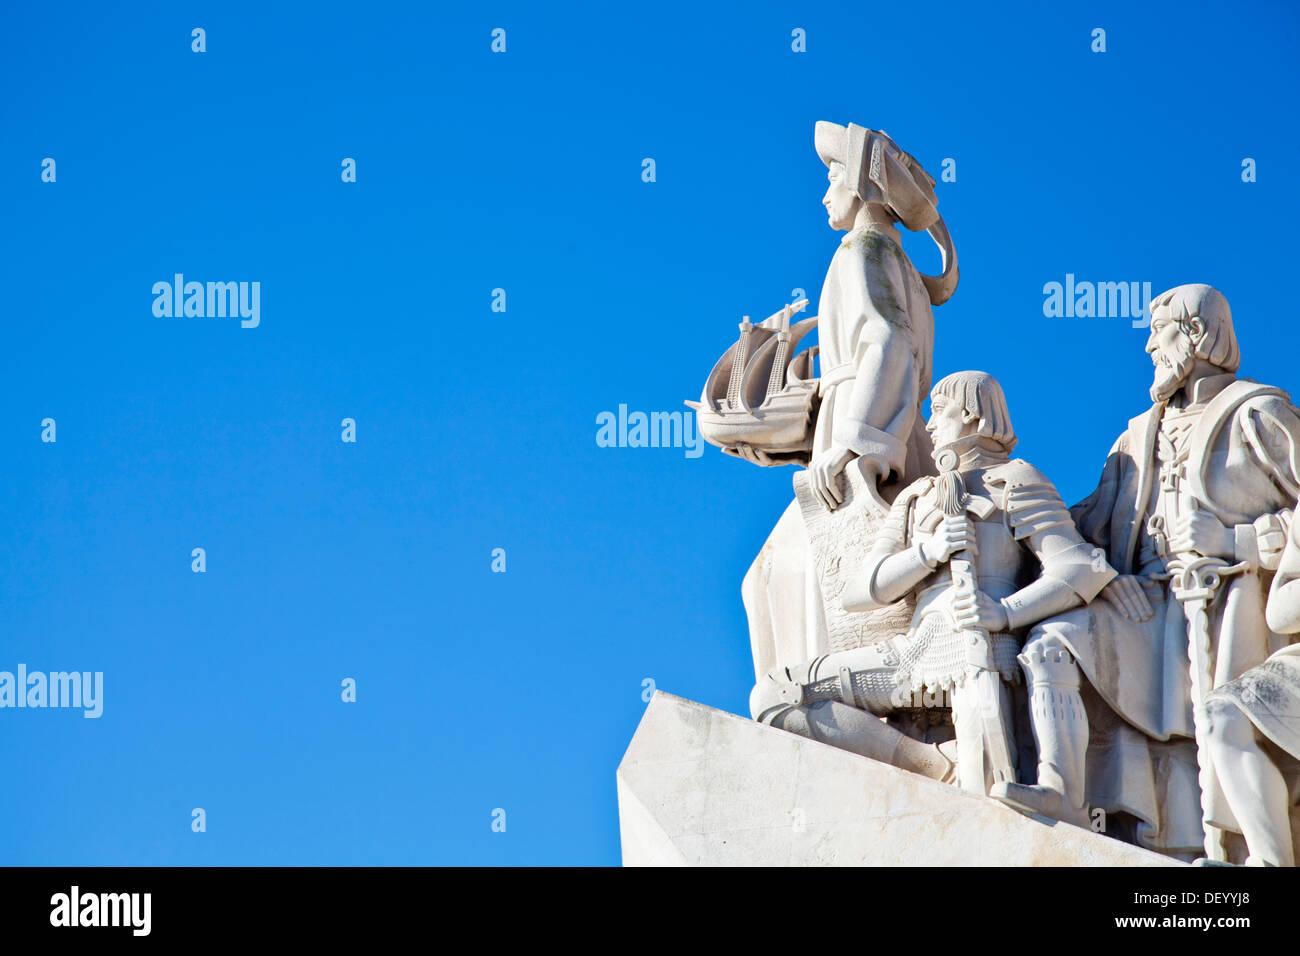 Padrão dos Descobrimentos, Monument to the Discoveries, celebrating Henri the Navigator and the Portuguese Age of Discovery and - Stock Image